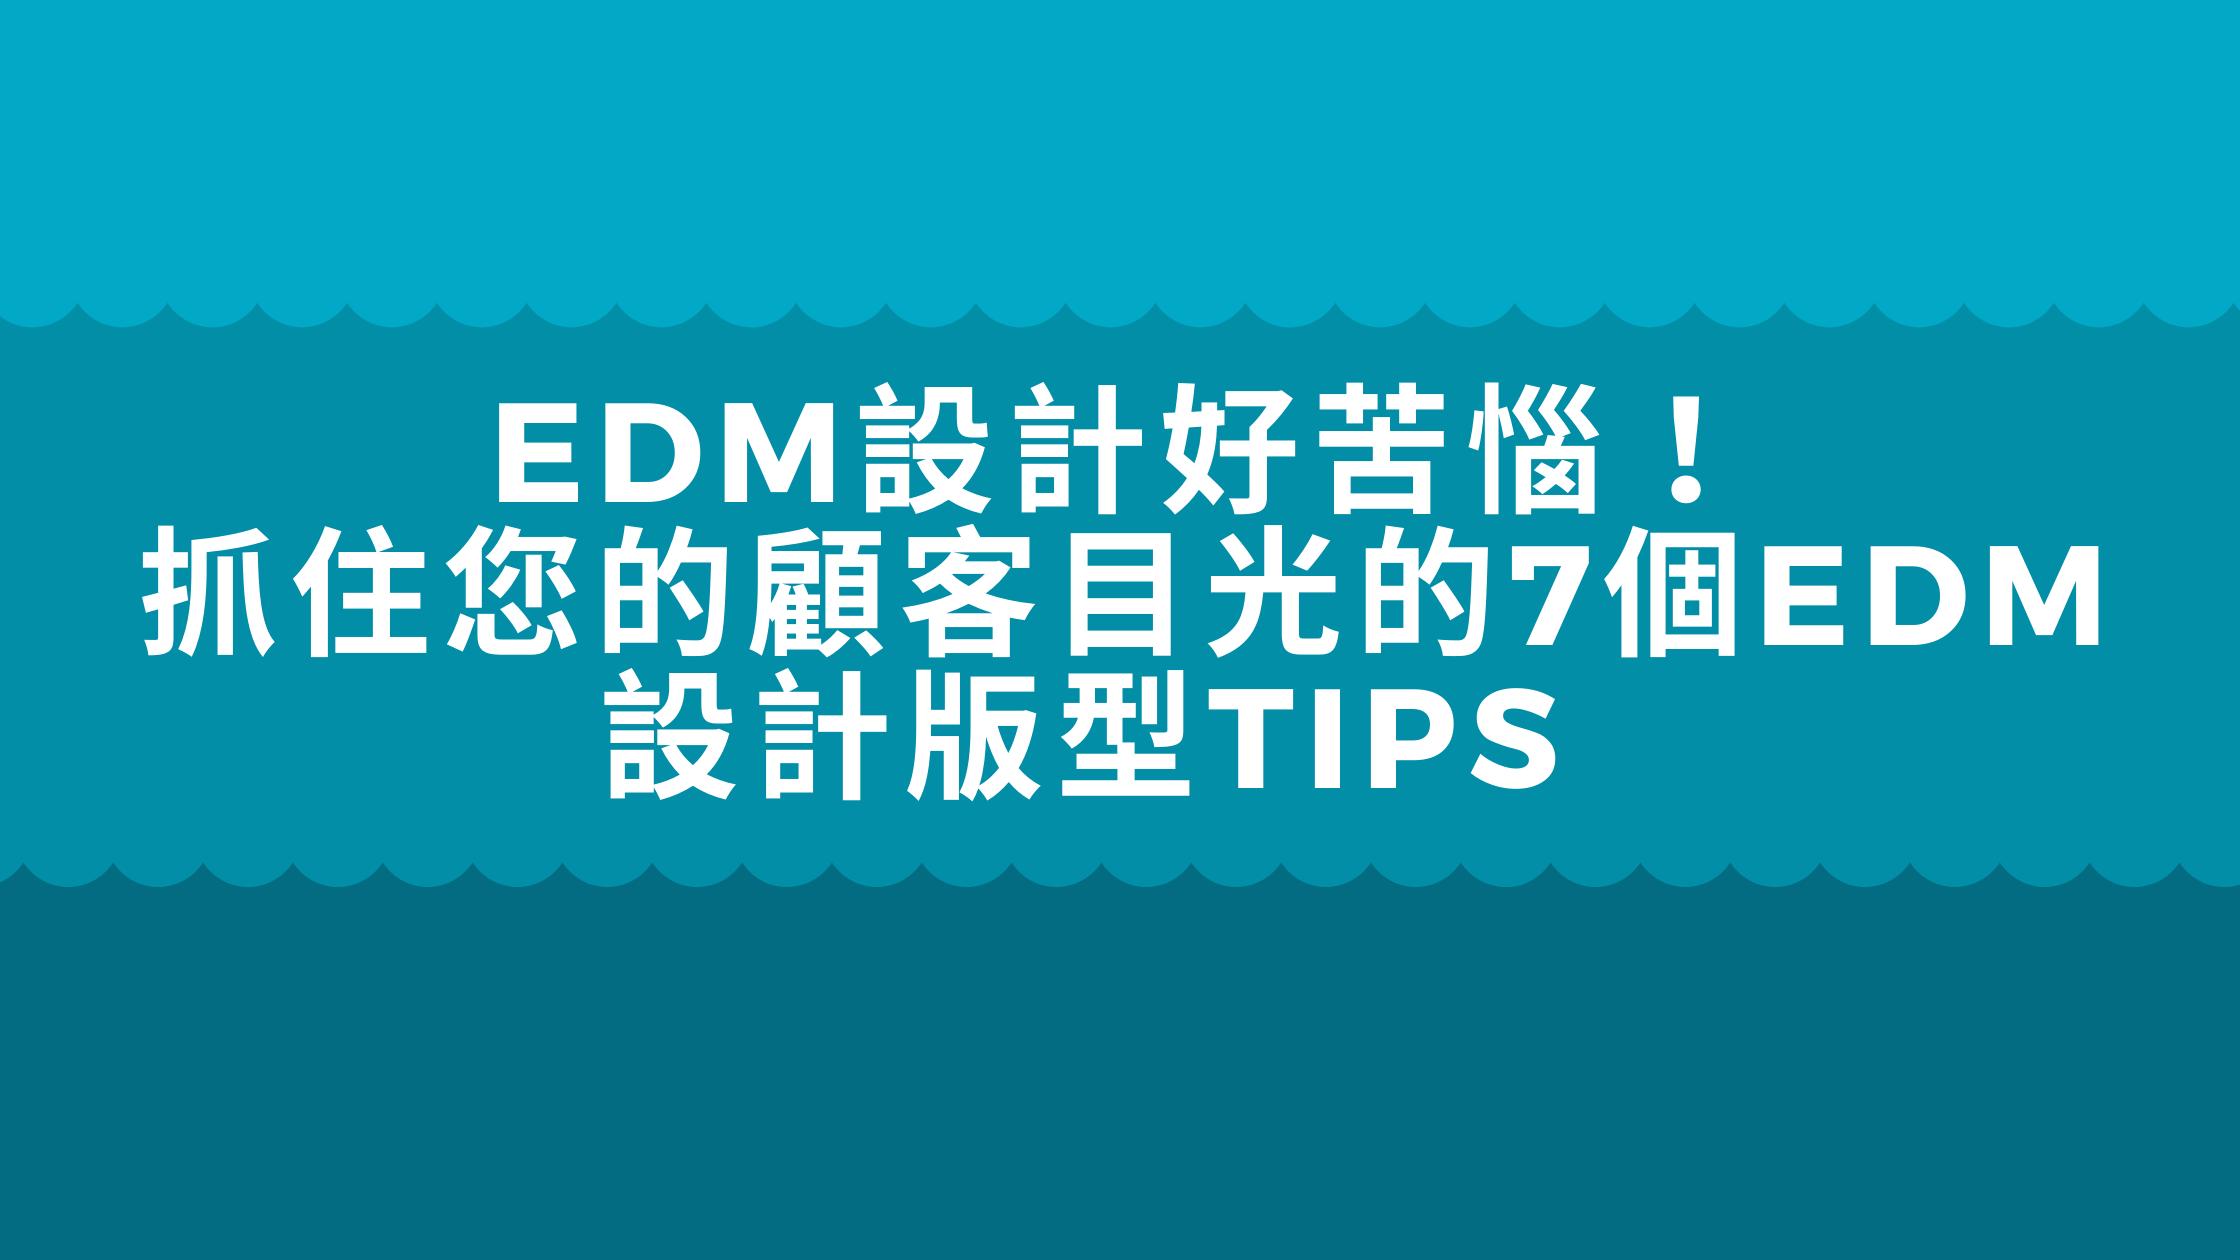 EDM 設計好苦惱! 抓住您的顧客目光的 7 個 EDM 設計版型 TIPS